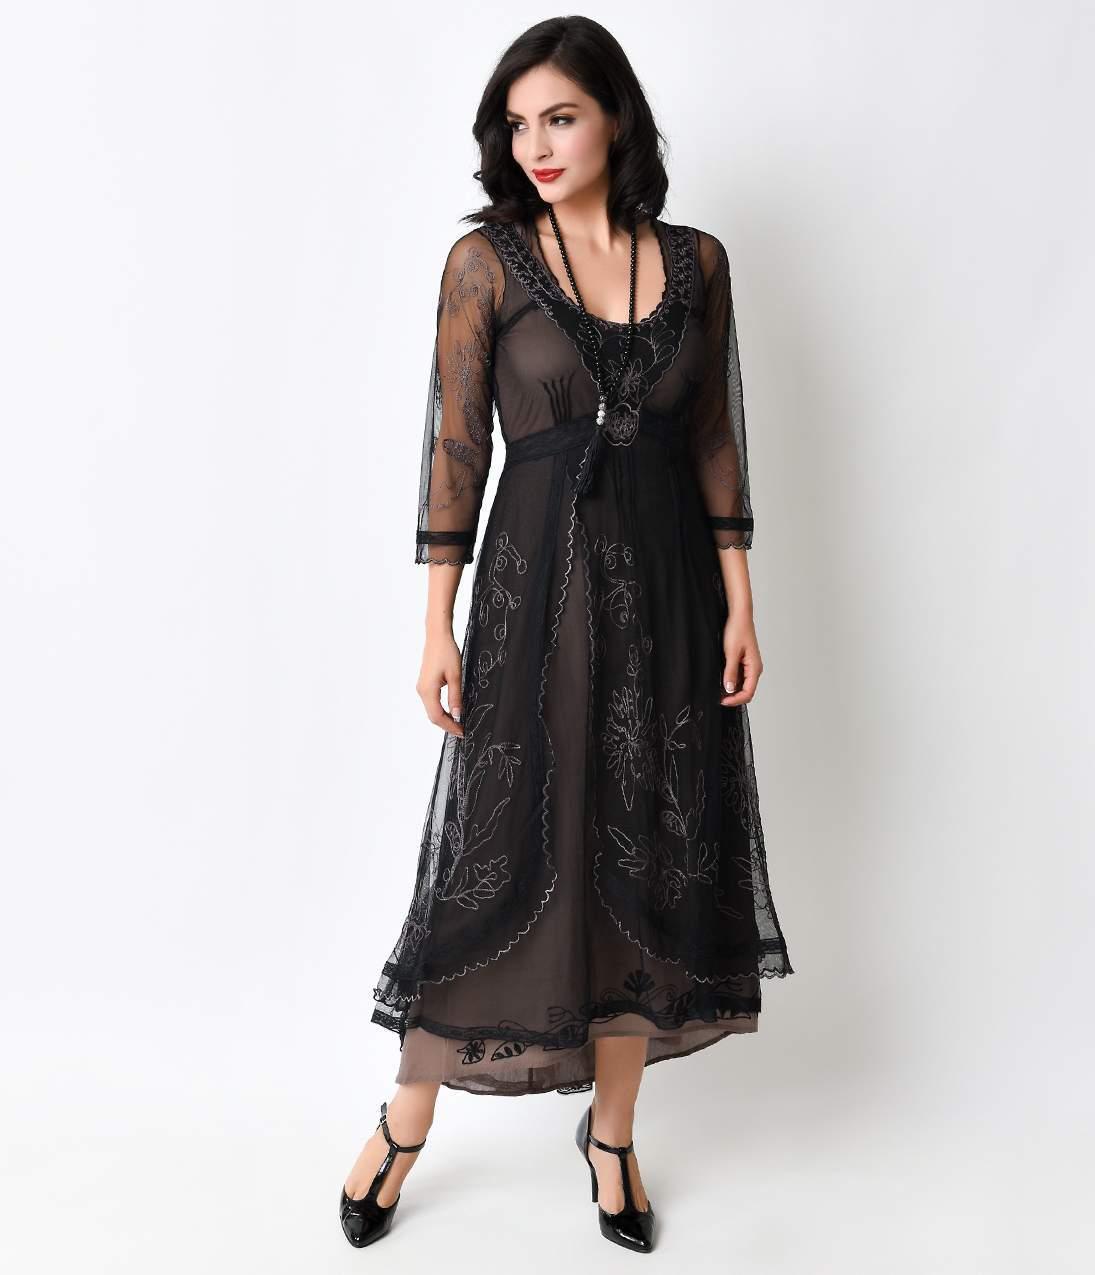 Nataya_1930s_Black_Tulle_Downton_Abbey_Tea_Party_Dress_4_006cb08b-3876-460d-b51d-c8d1fd966611.jpg